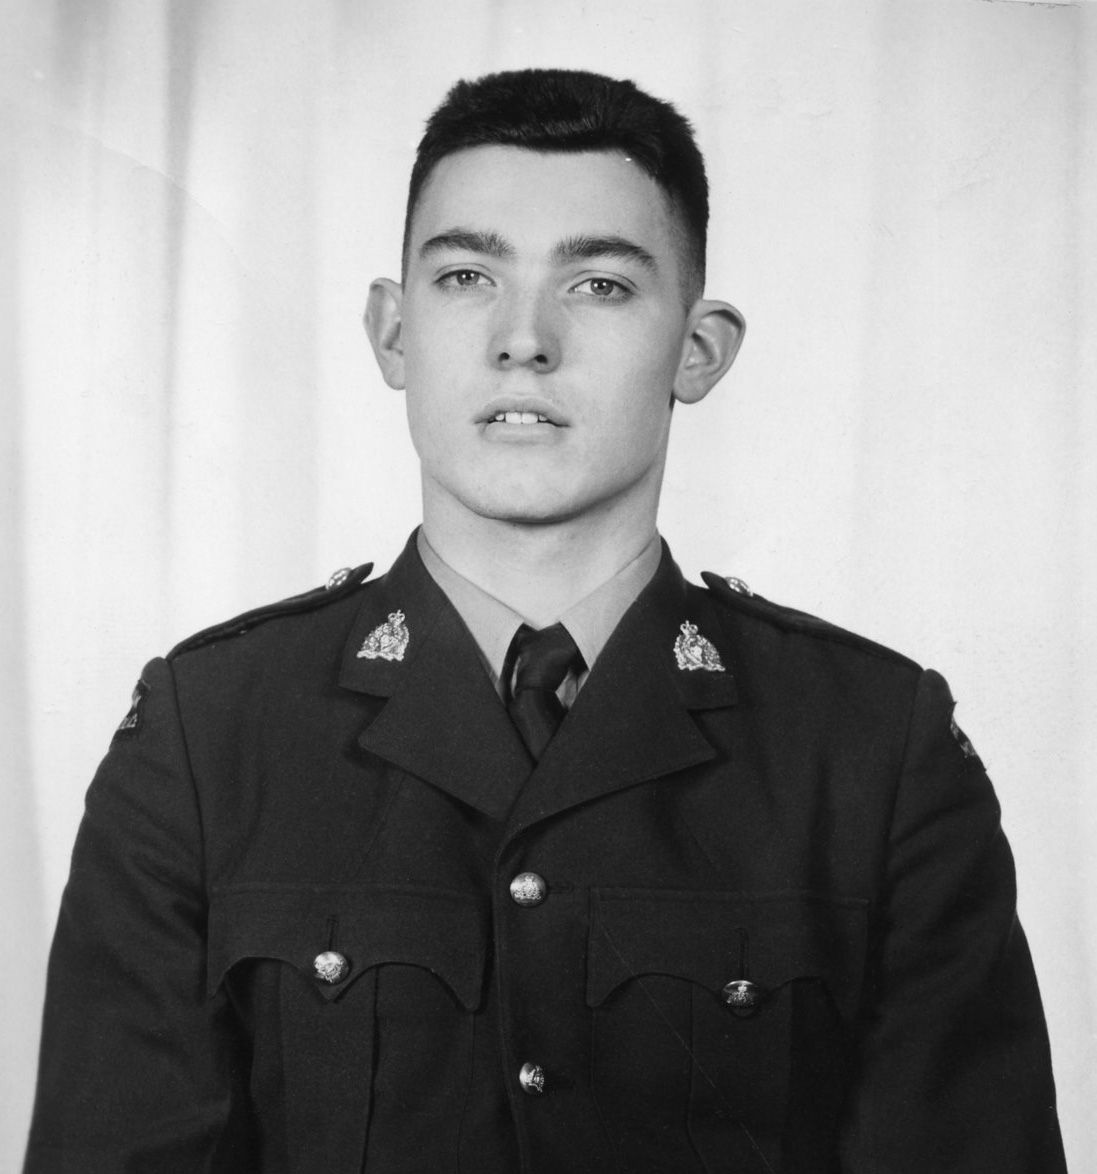 Gendarme Colin Eric Lelliott